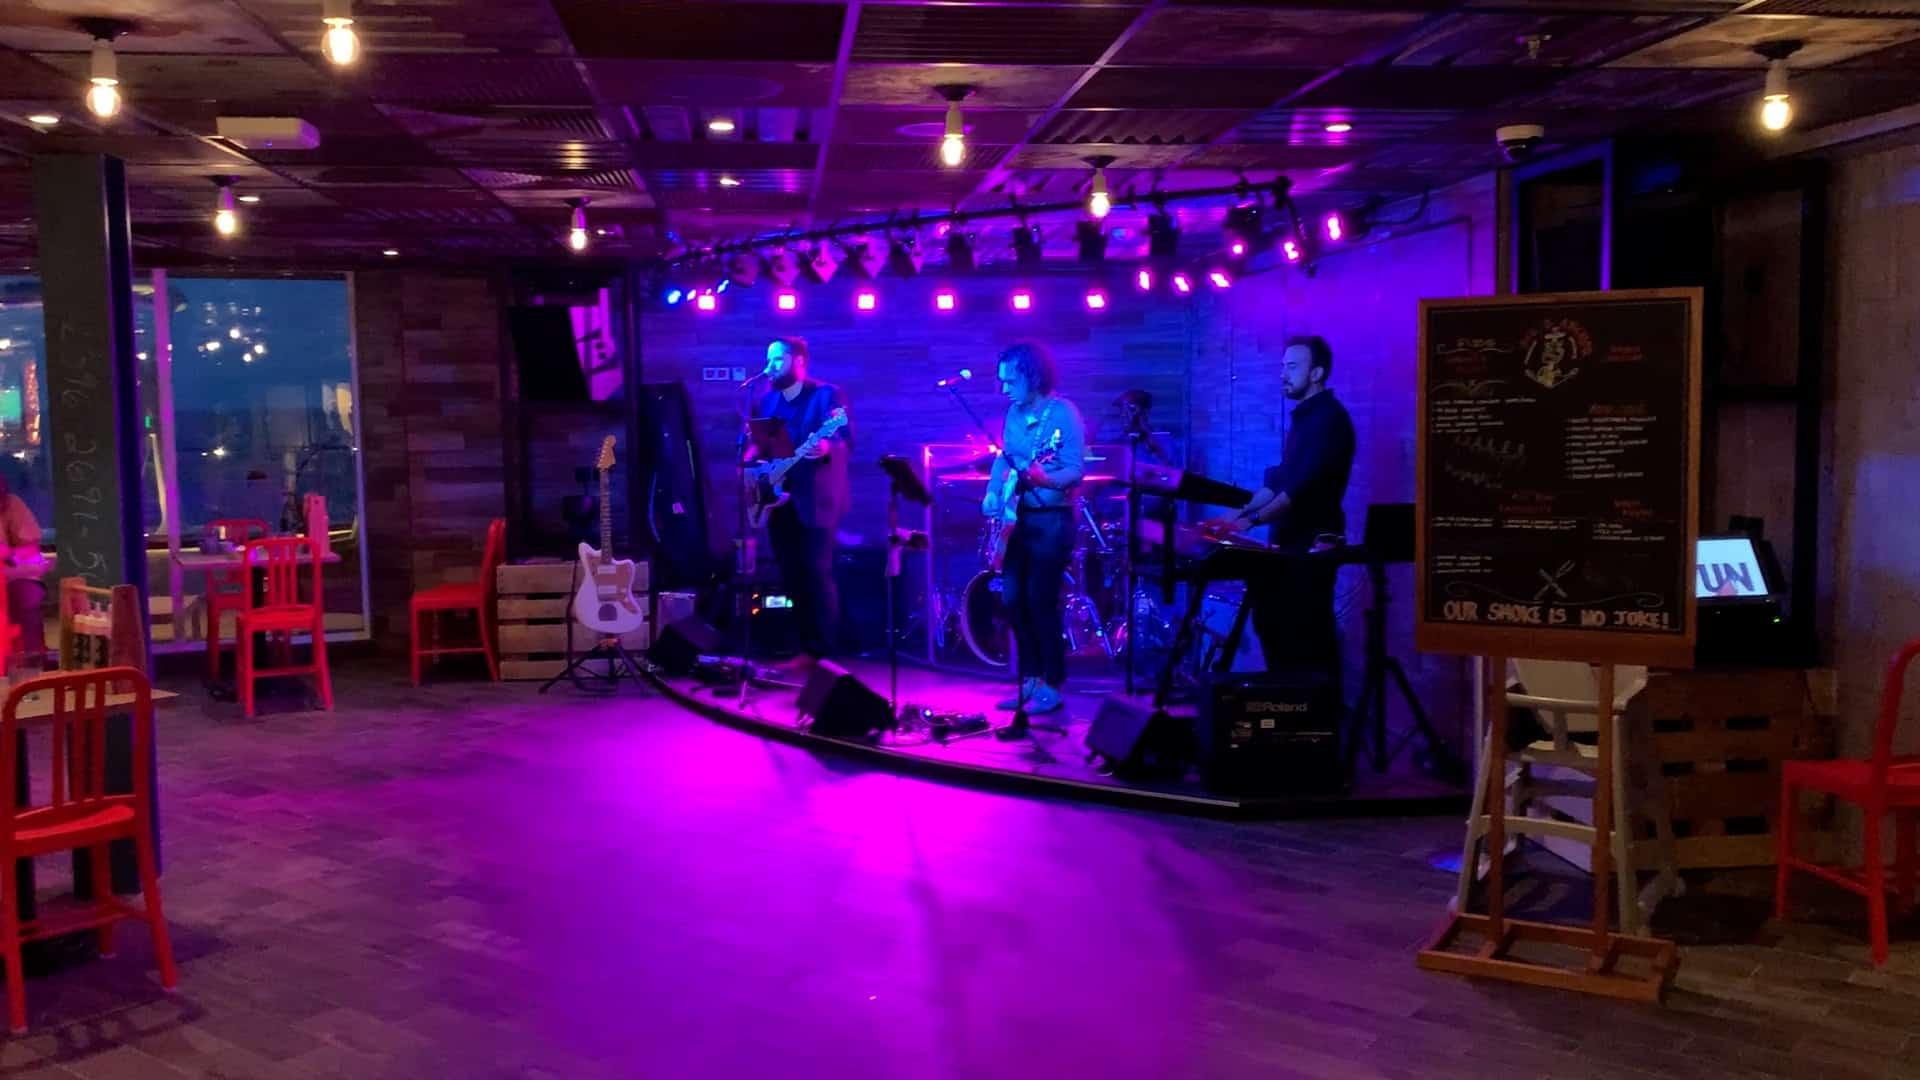 guy's pig and anchor smokehouse band music